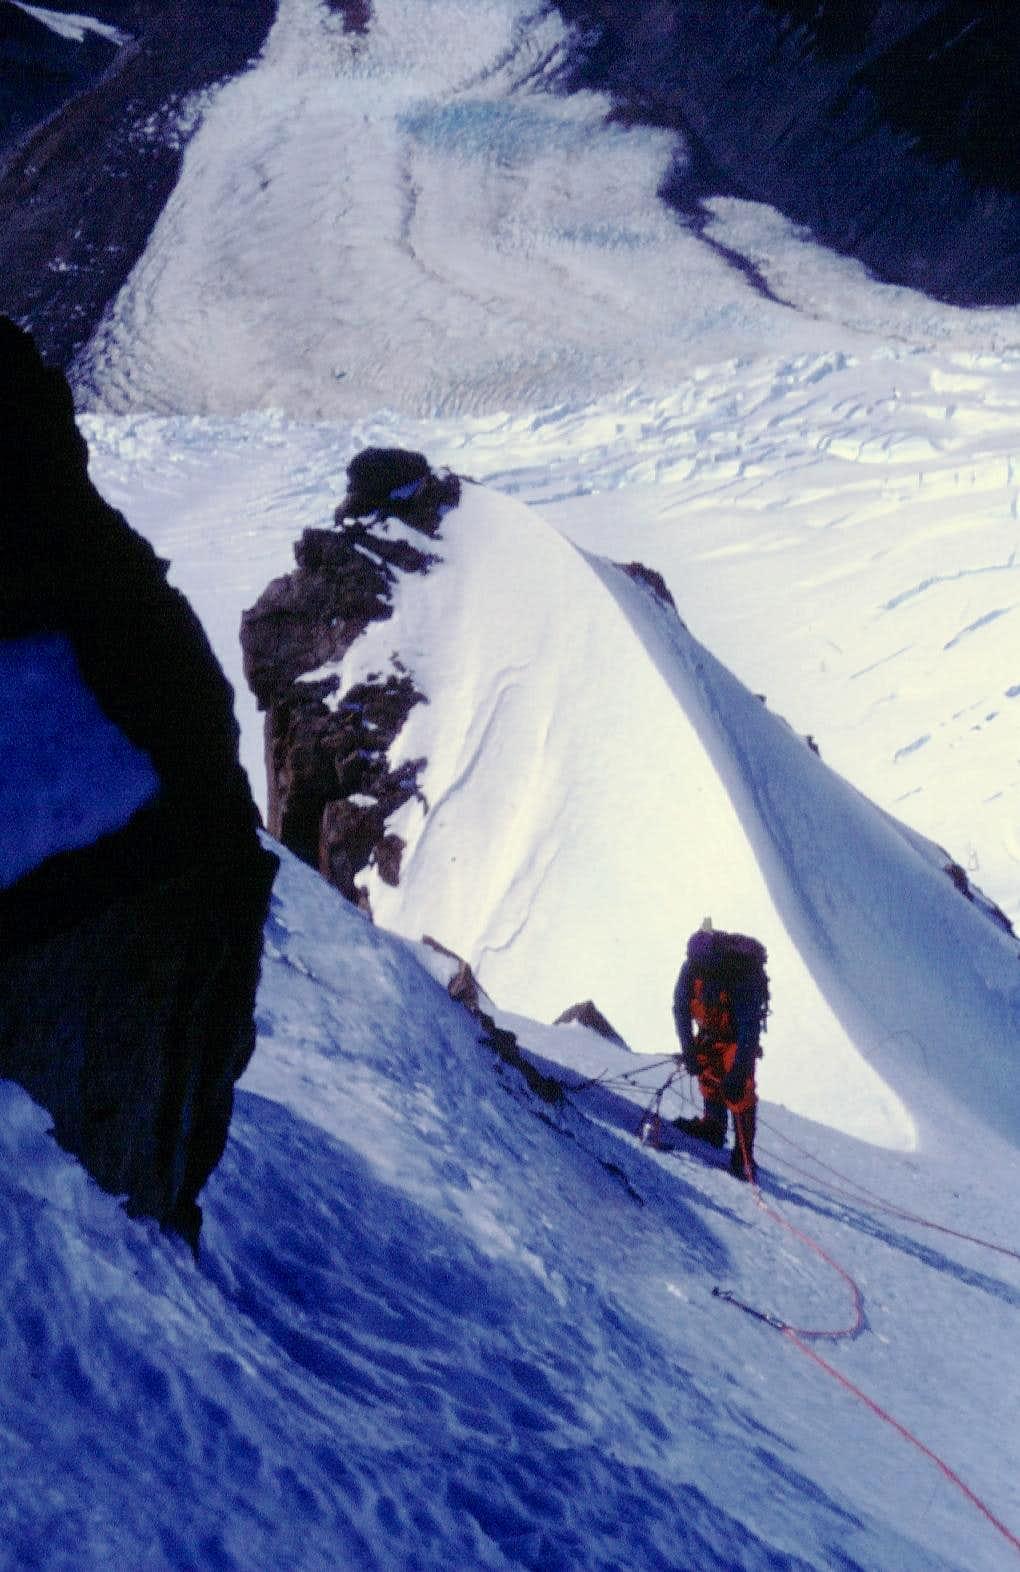 Belay along Luce de Leche, Cerro Nato (Patagonia)